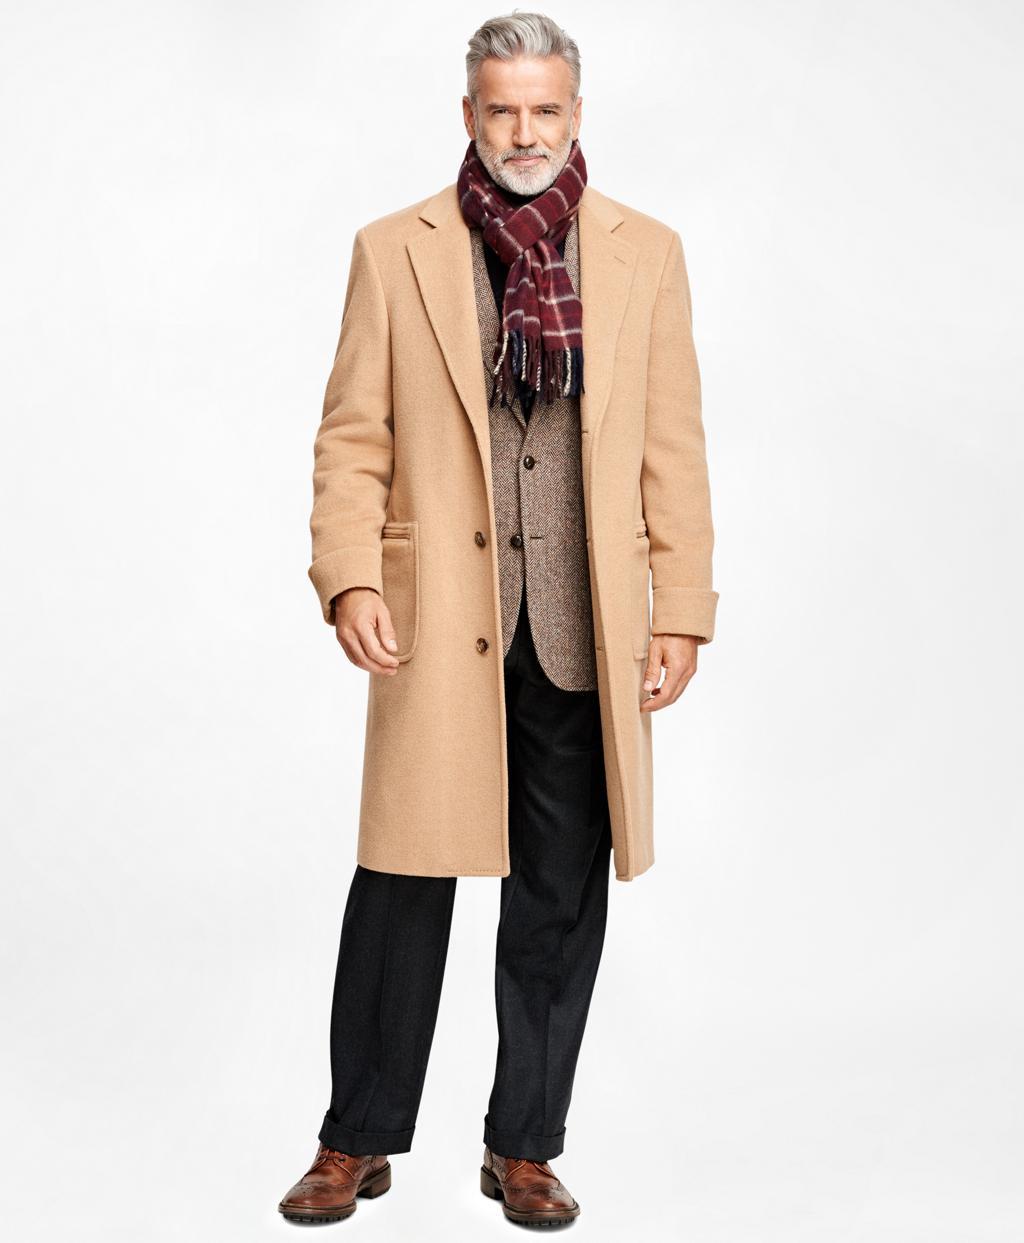 66c1780eabaa8 Brooks Brothers. Men s Natural Golden Fleece Single-breasted Polo Coat